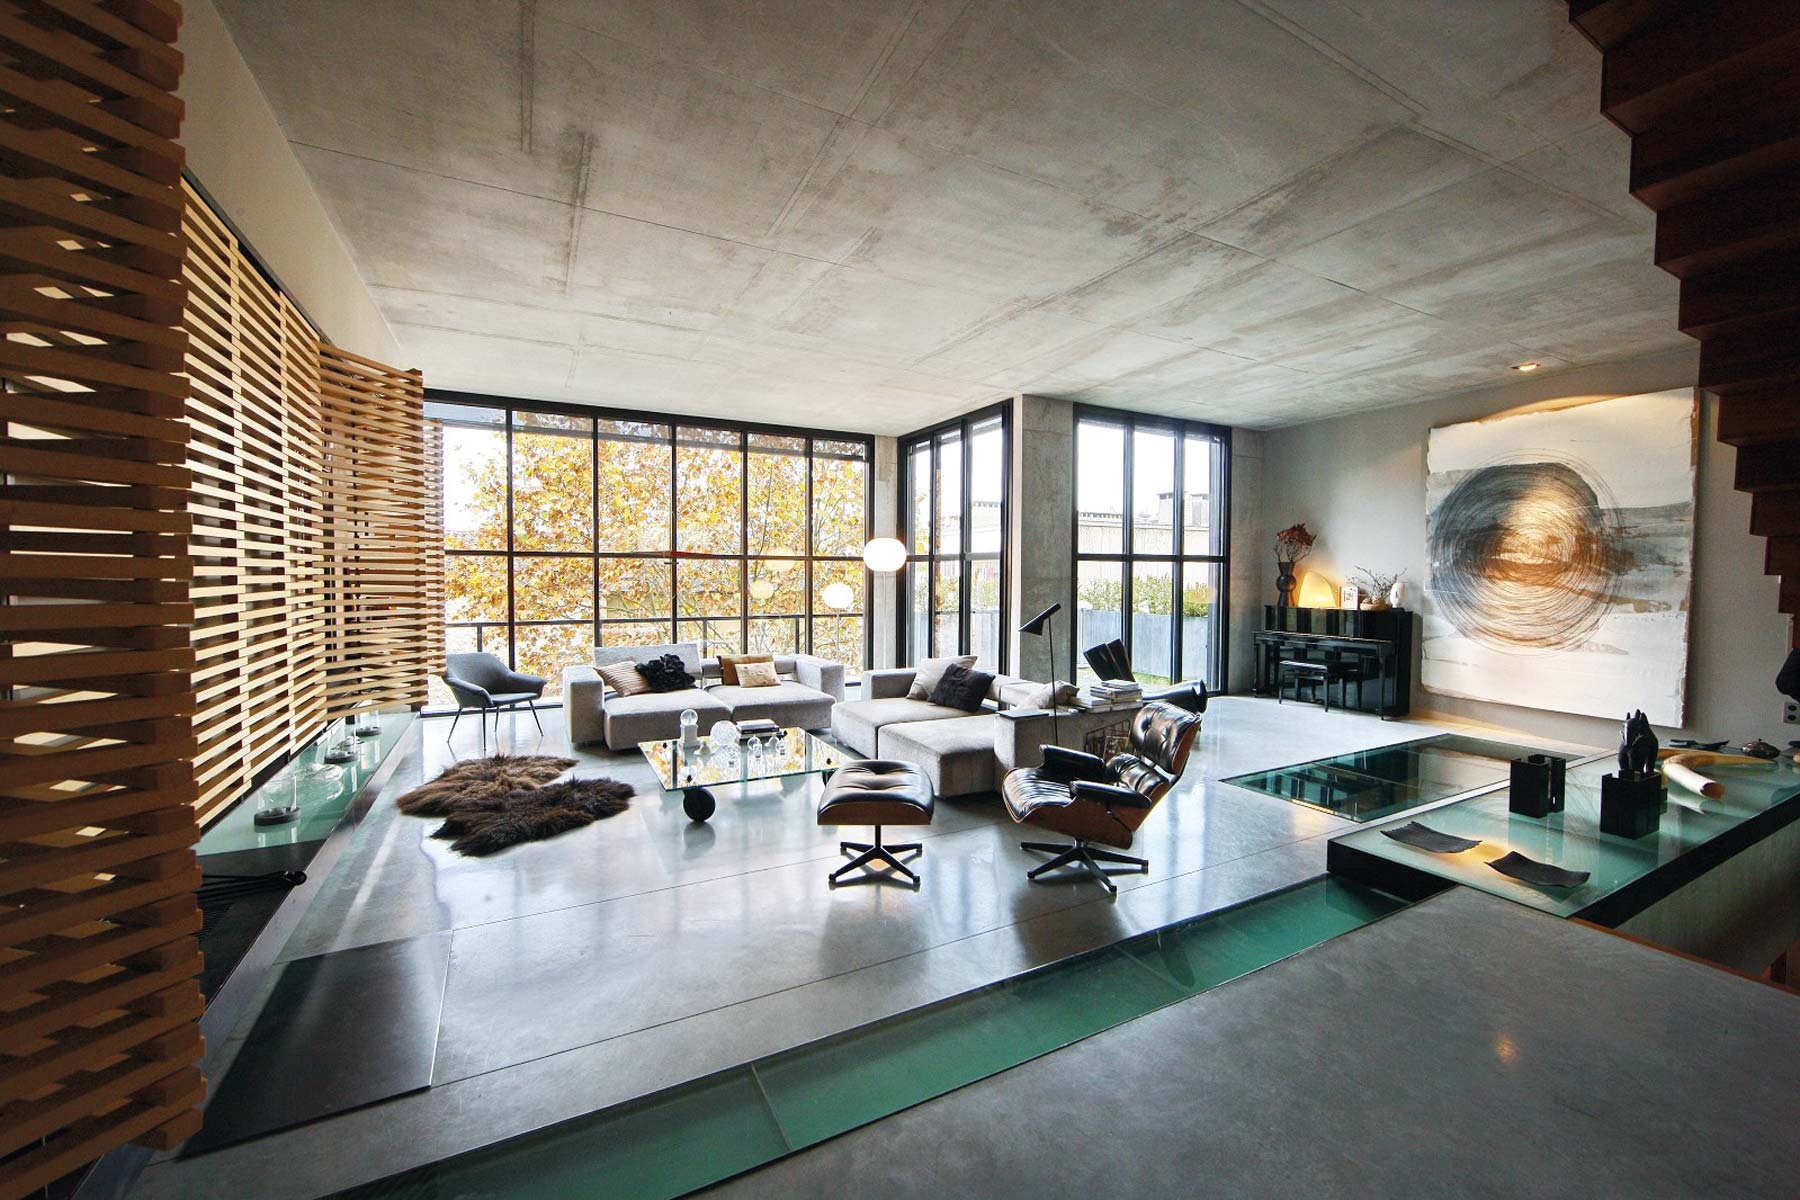 Stunning Loft One Bordeaux Images - Joshkrajcik.us - joshkrajcik.us